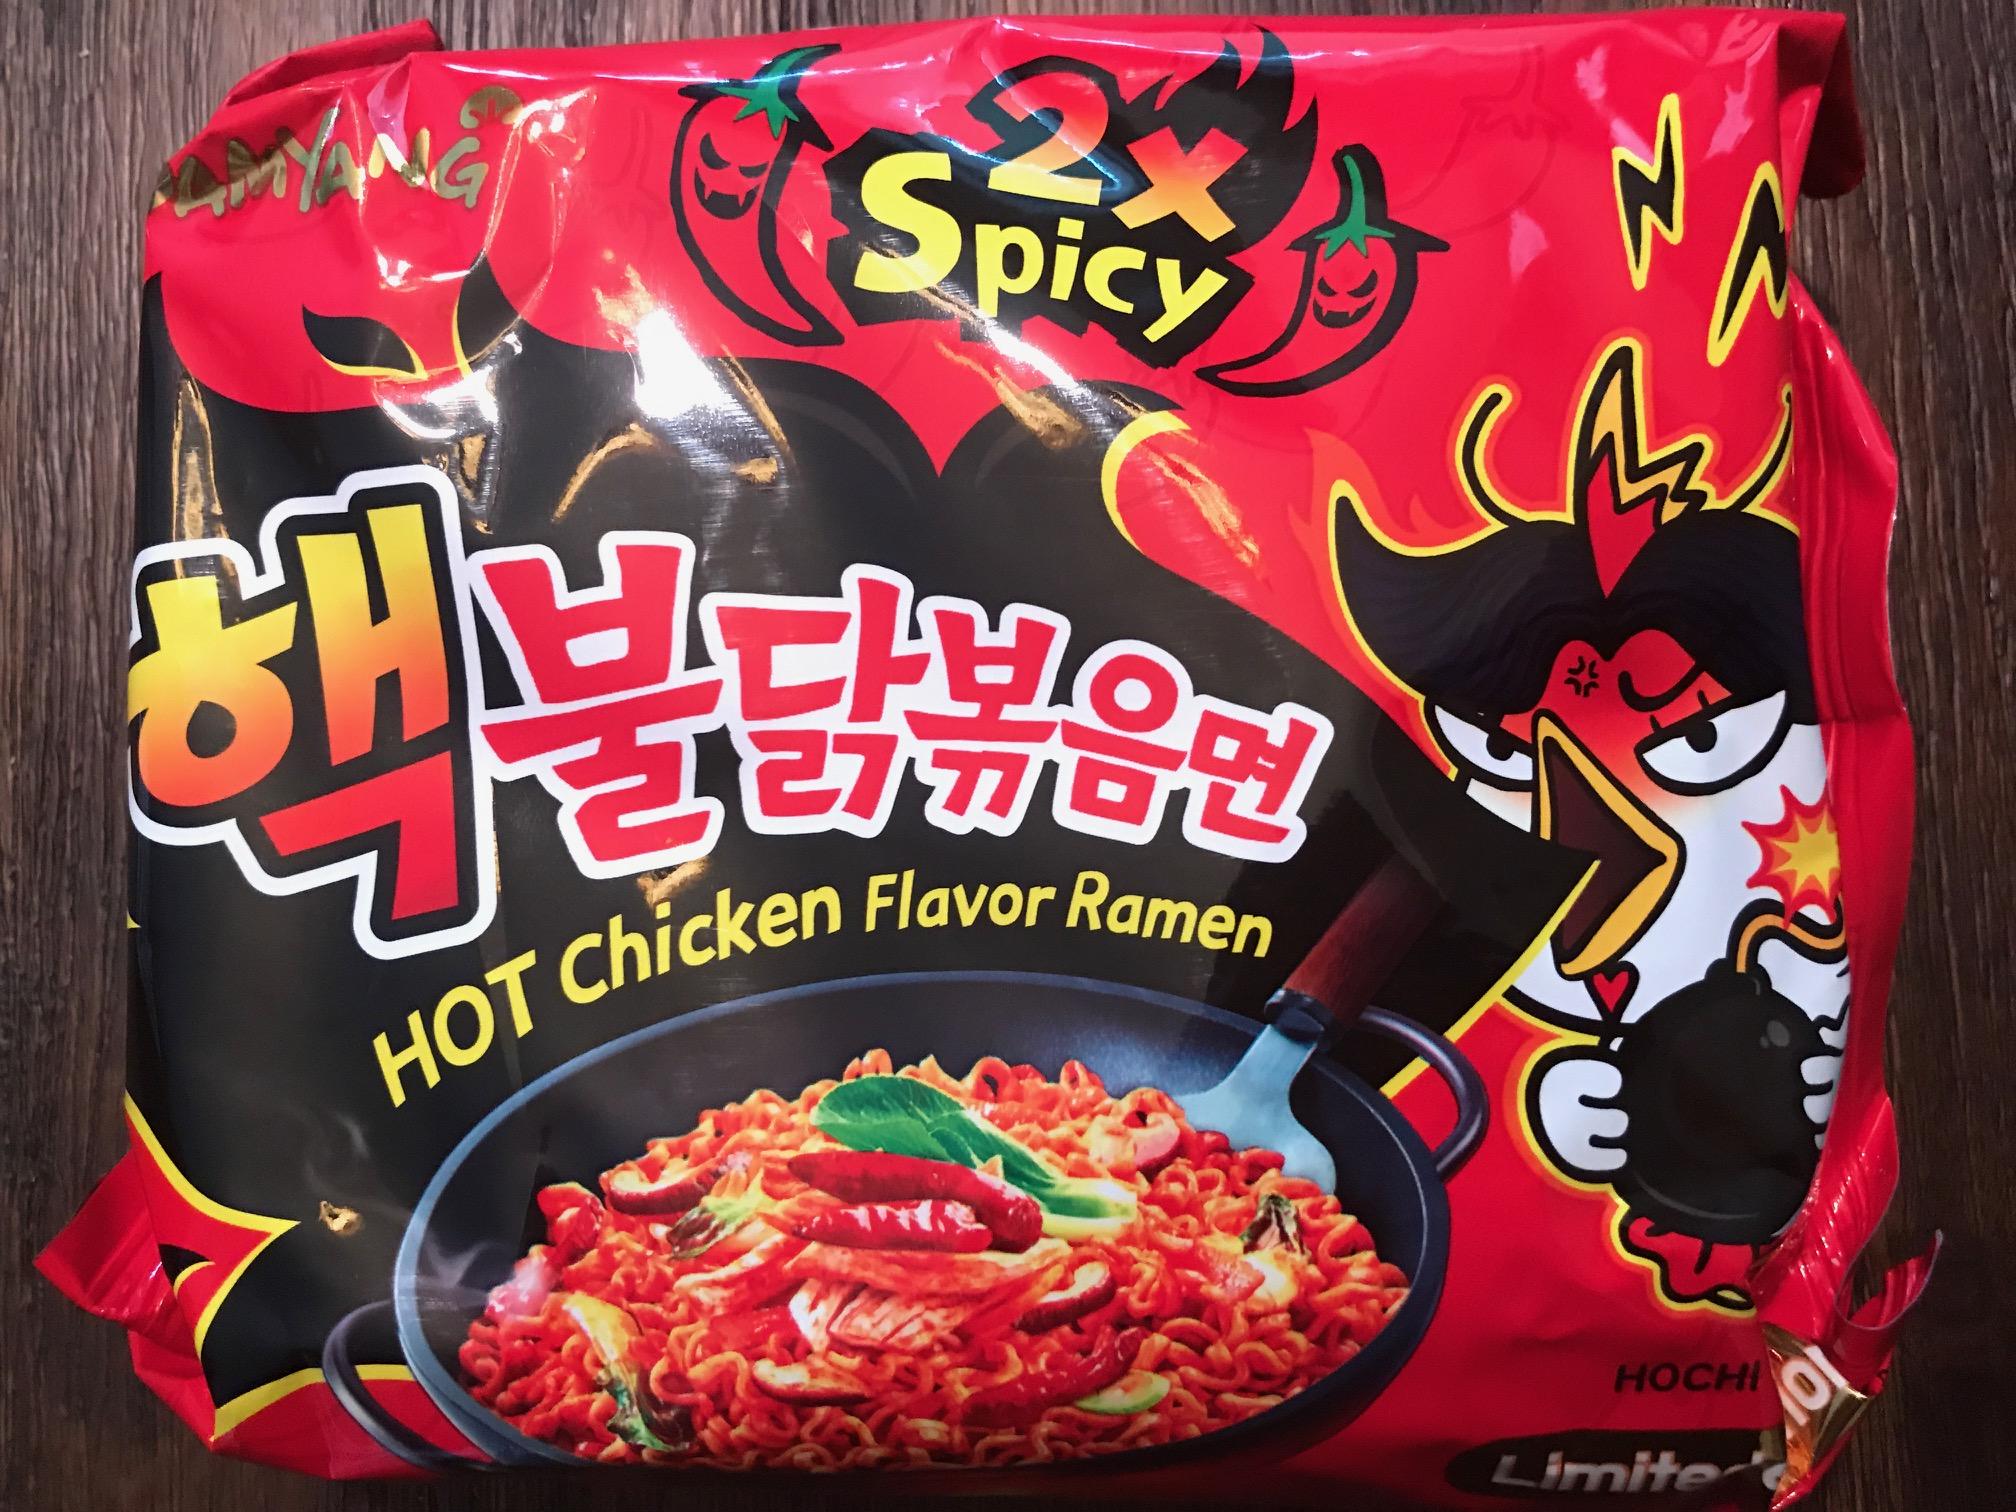 Best Korean Spicy Instant Ramen - Samyang Buldak Hot Chicken Flavor Ramen